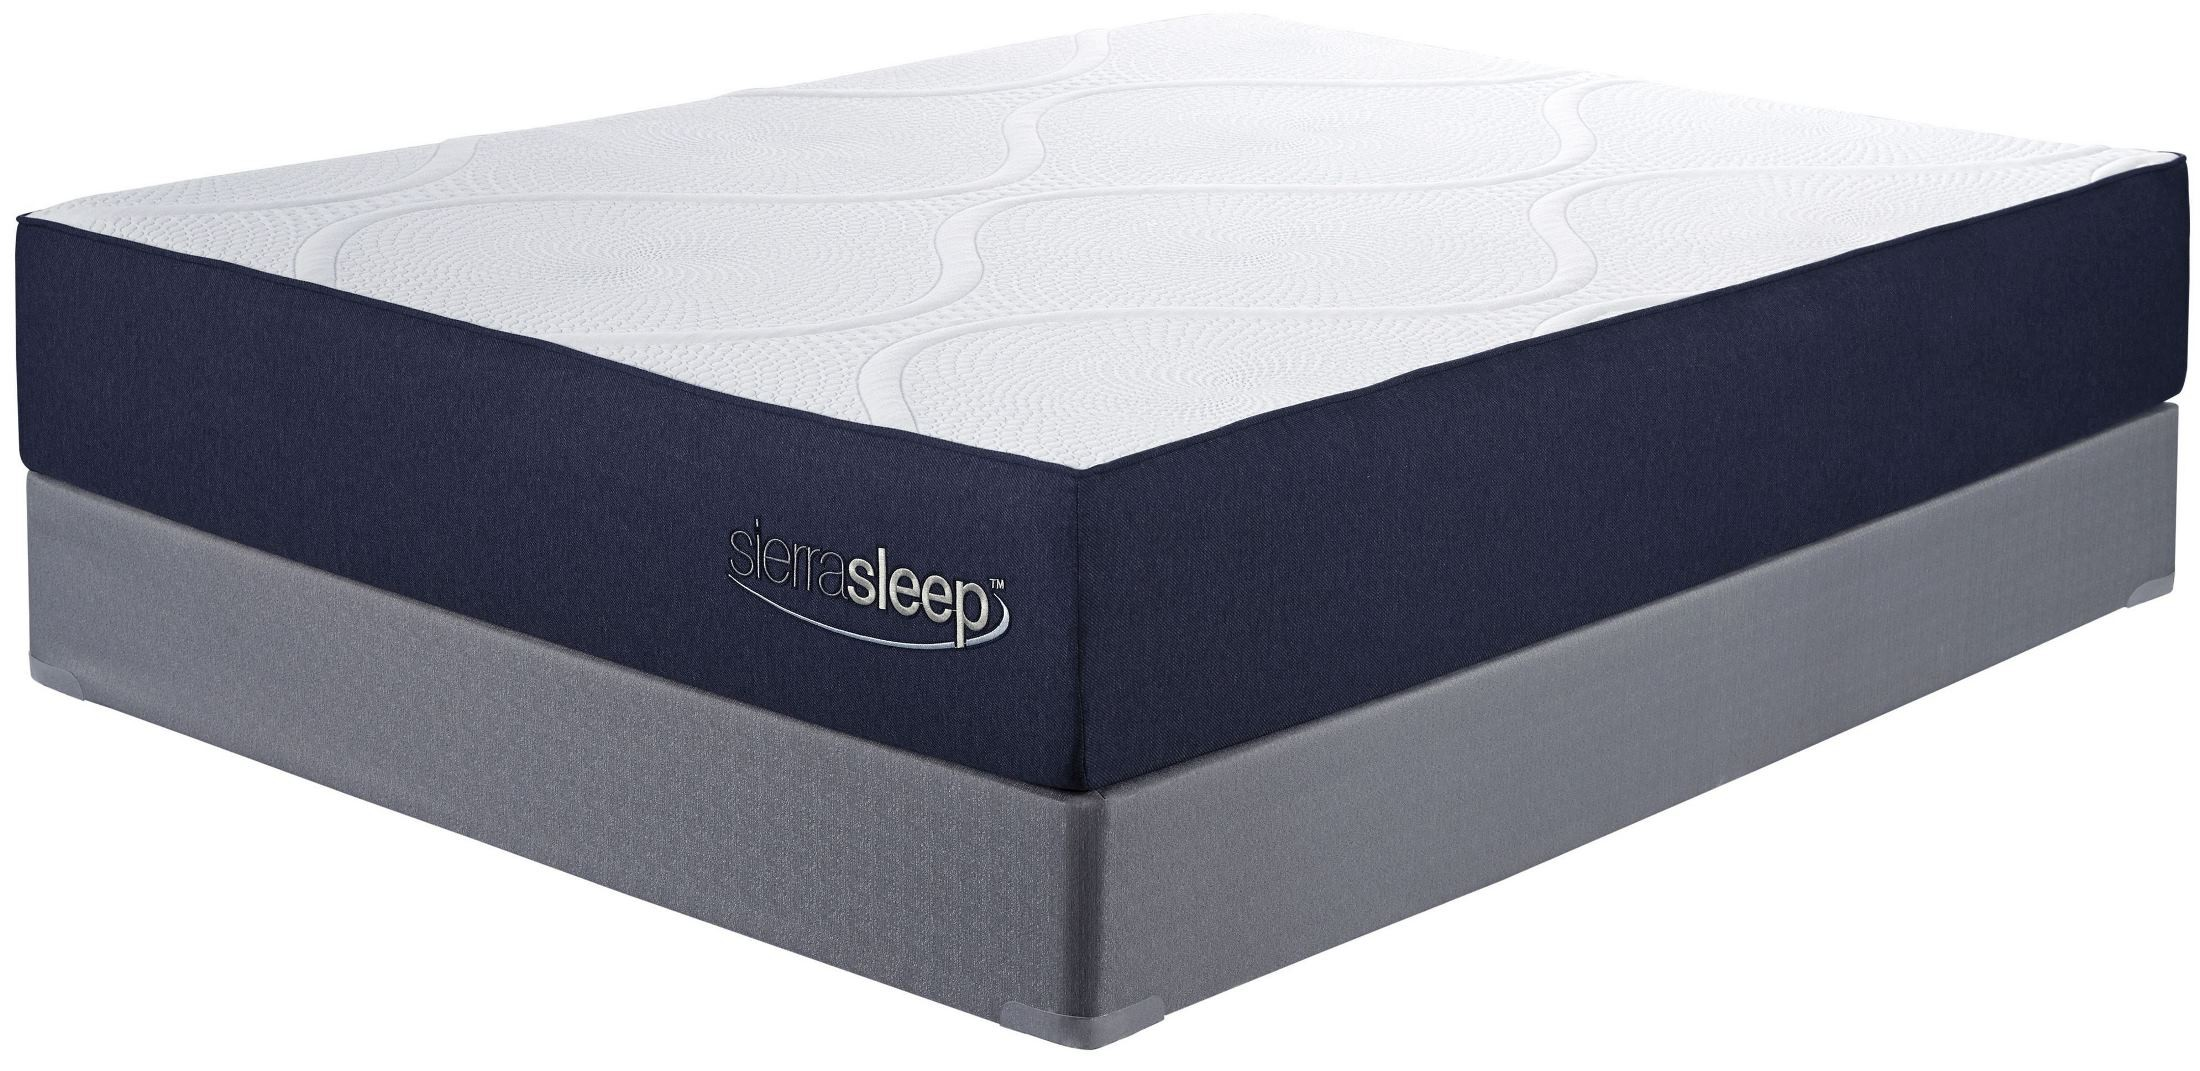 11 inch gel memory foam white queen mattress from ashley m97331 coleman furniture. Black Bedroom Furniture Sets. Home Design Ideas